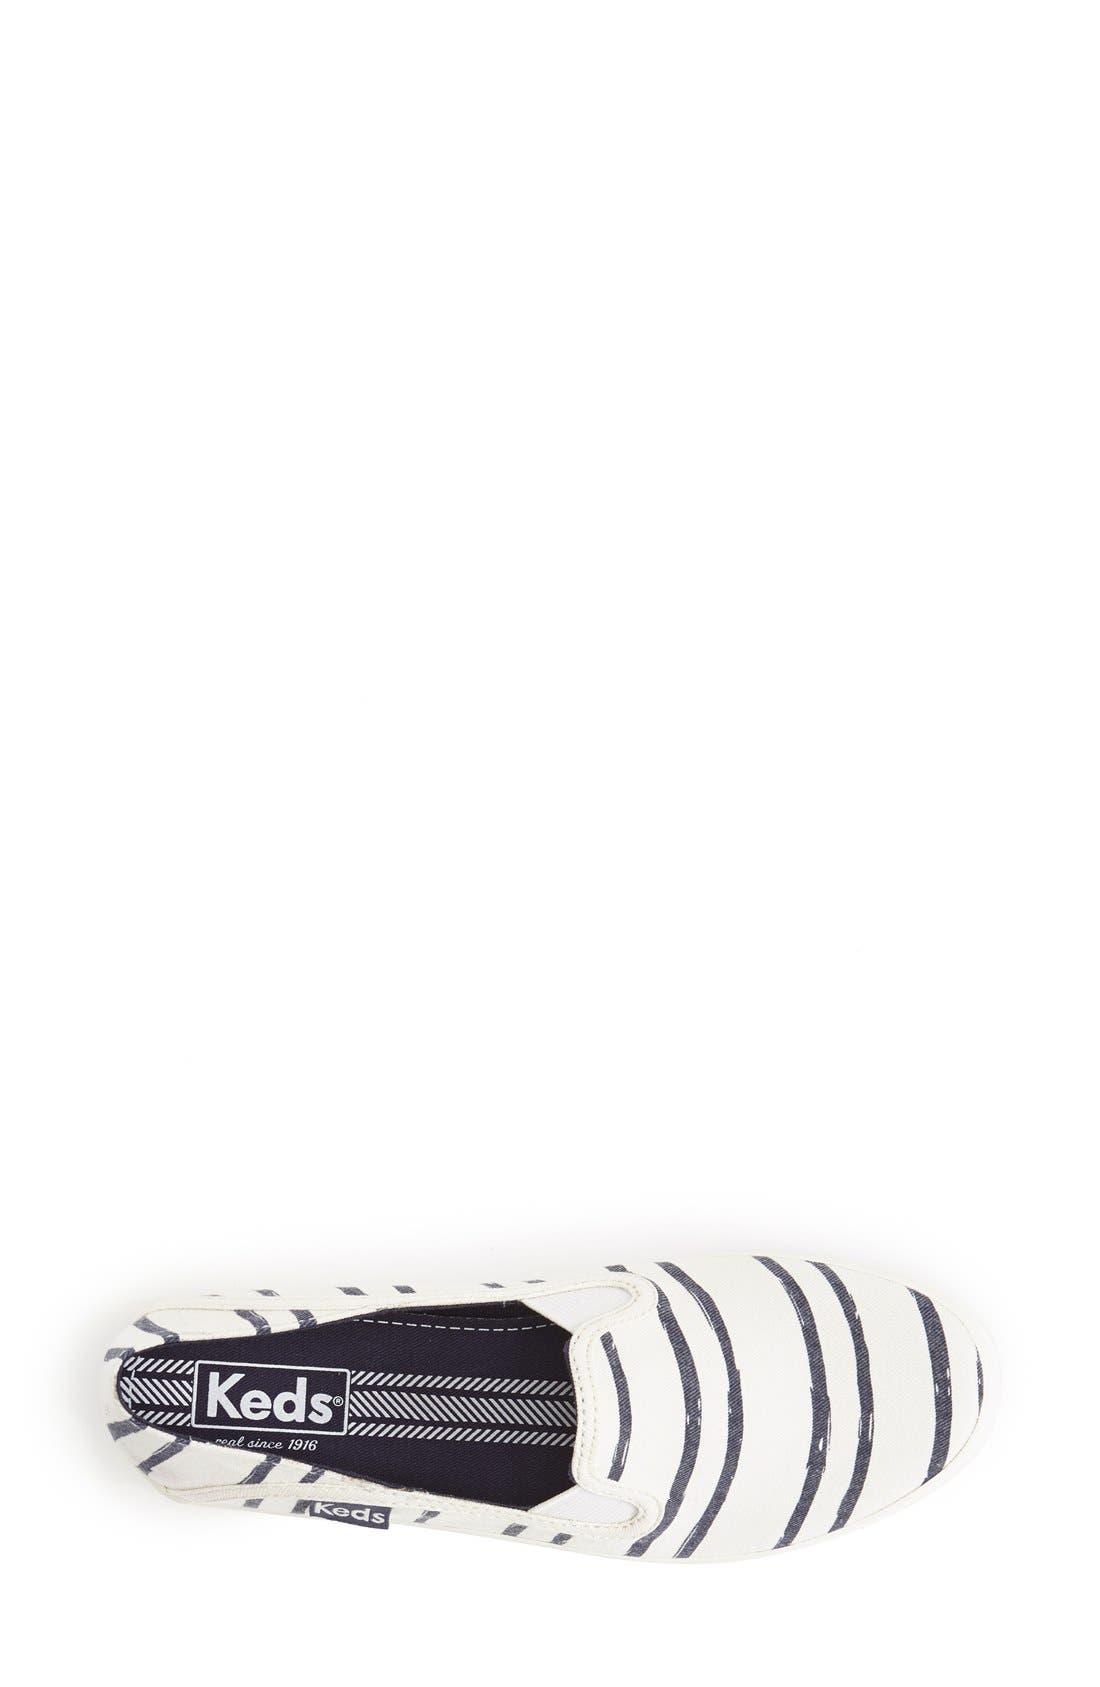 Alternate Image 3  - Keds® 'Crashback - Washed Beach Stripe' Slip-On Sneaker (Women)